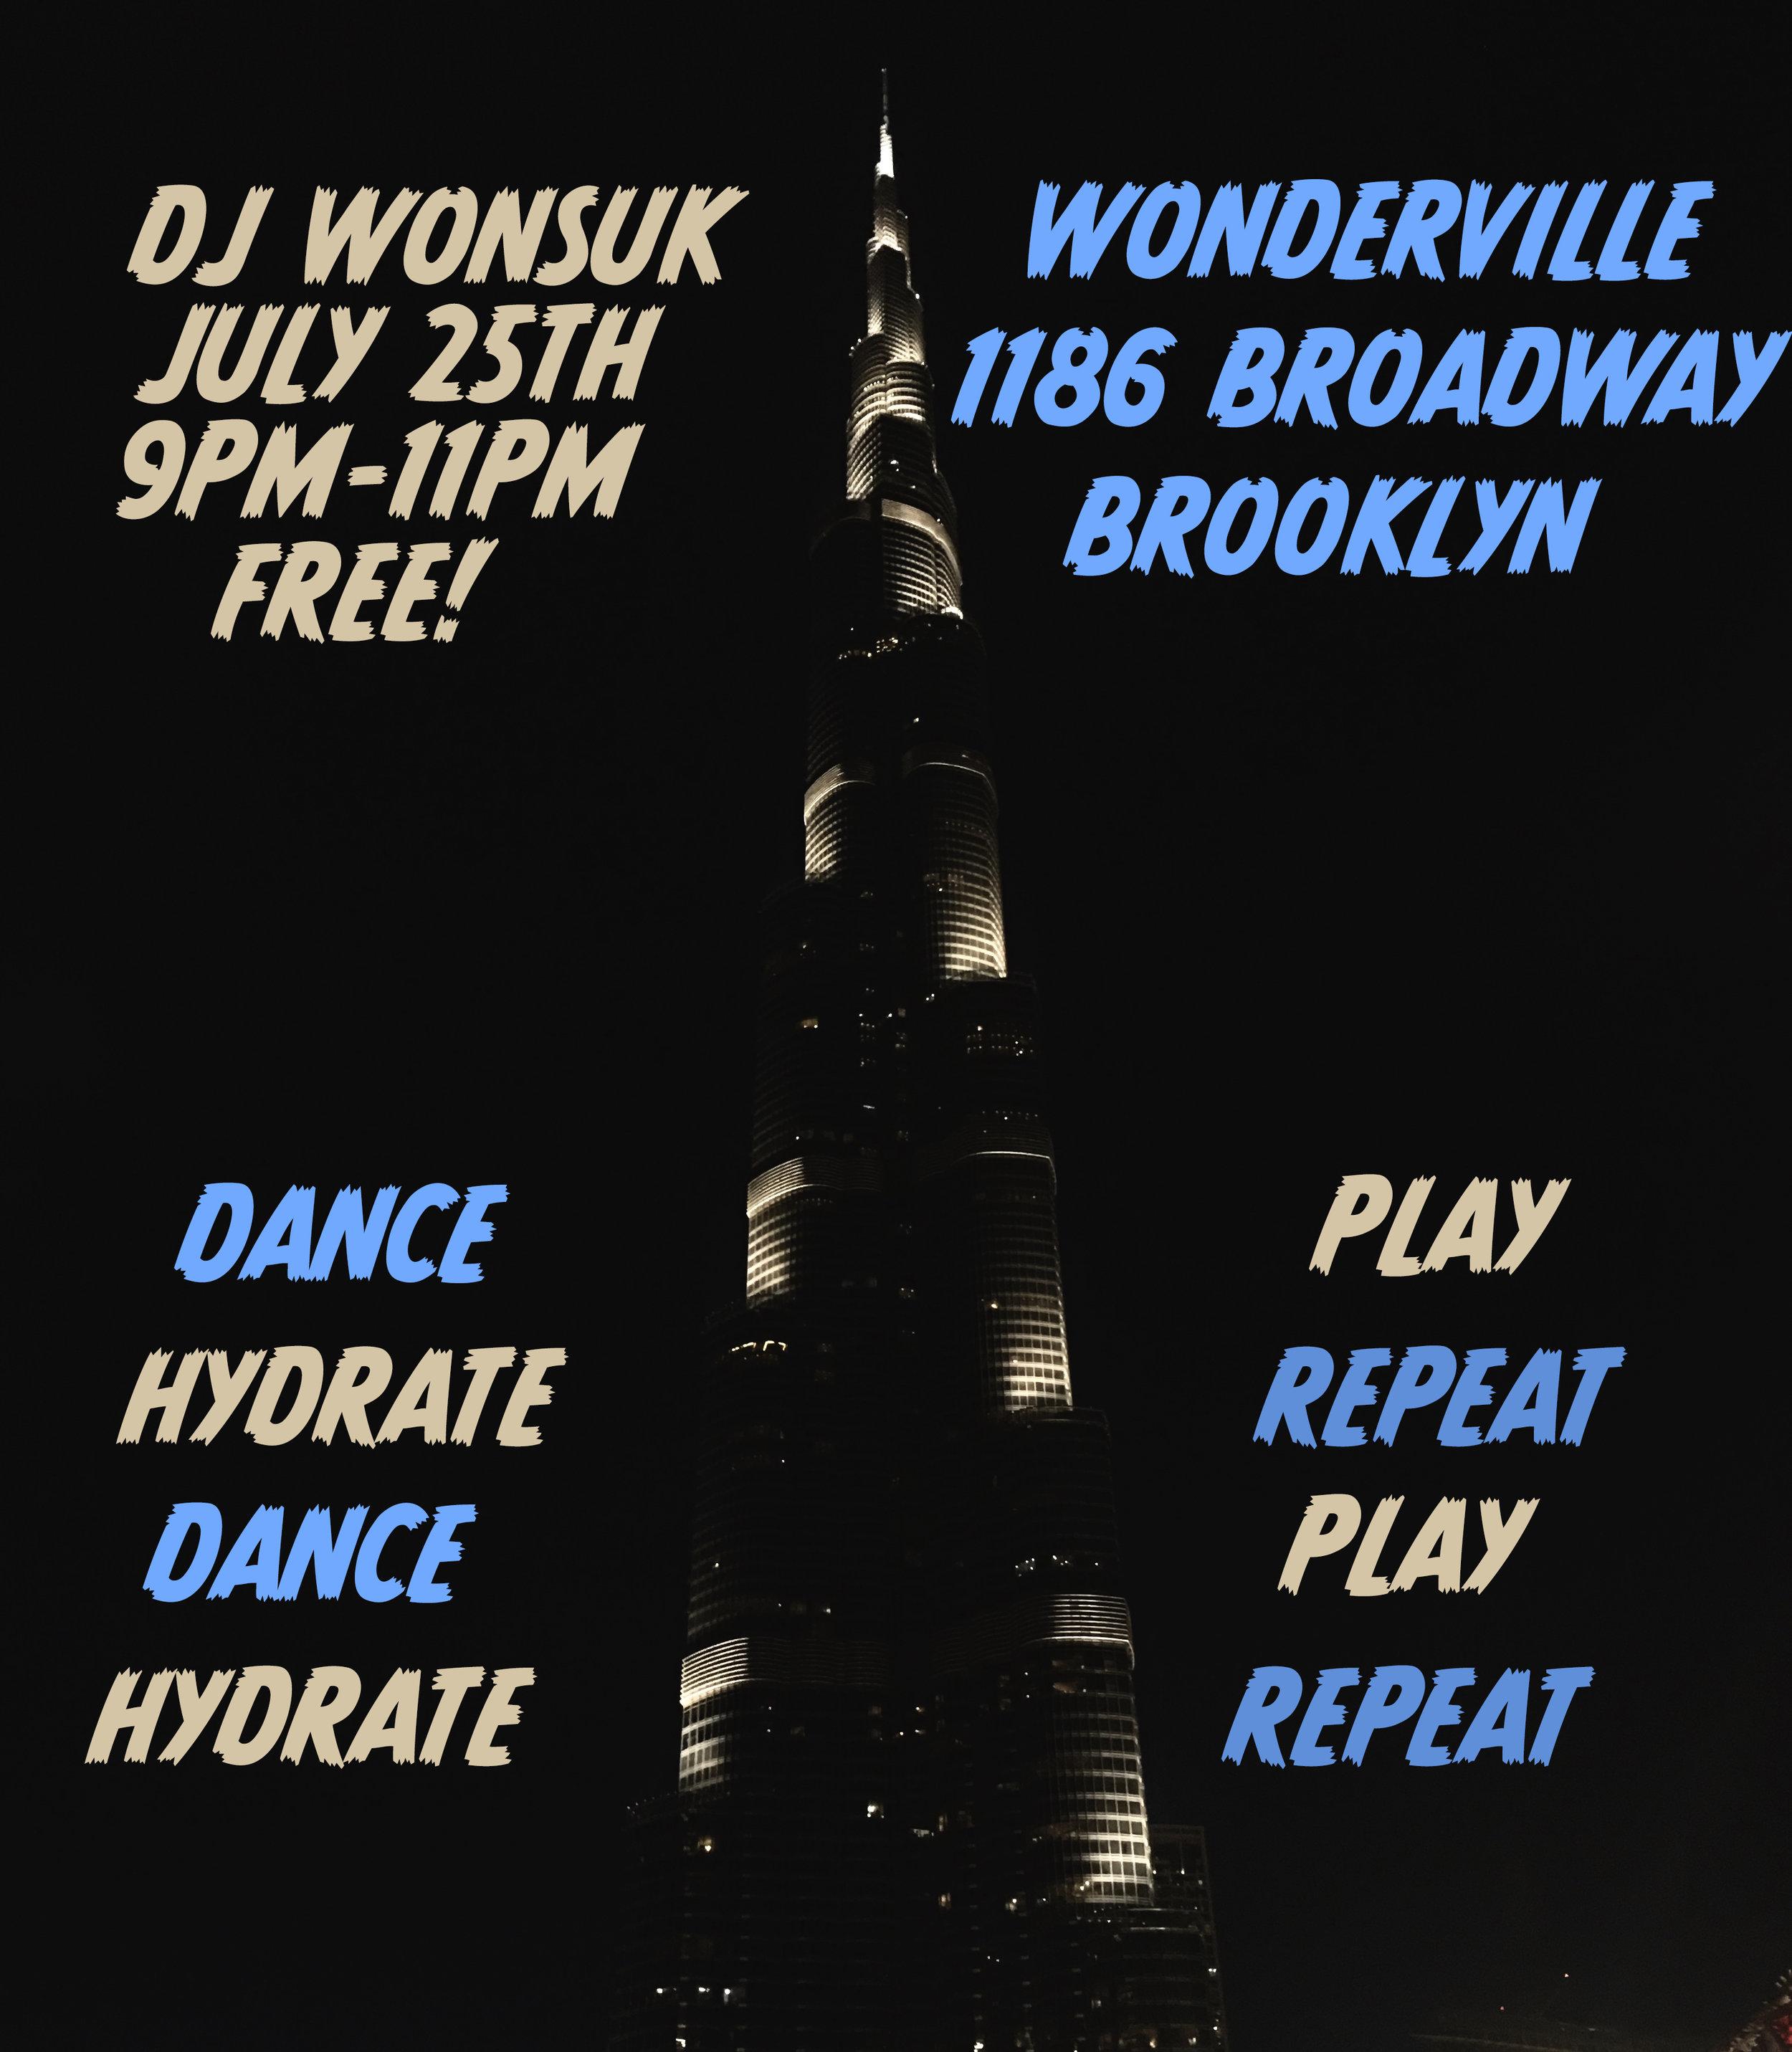 RSVP: https://withfriends.co/Event/2169262/DJ_Wonsuk_at_Wonderville